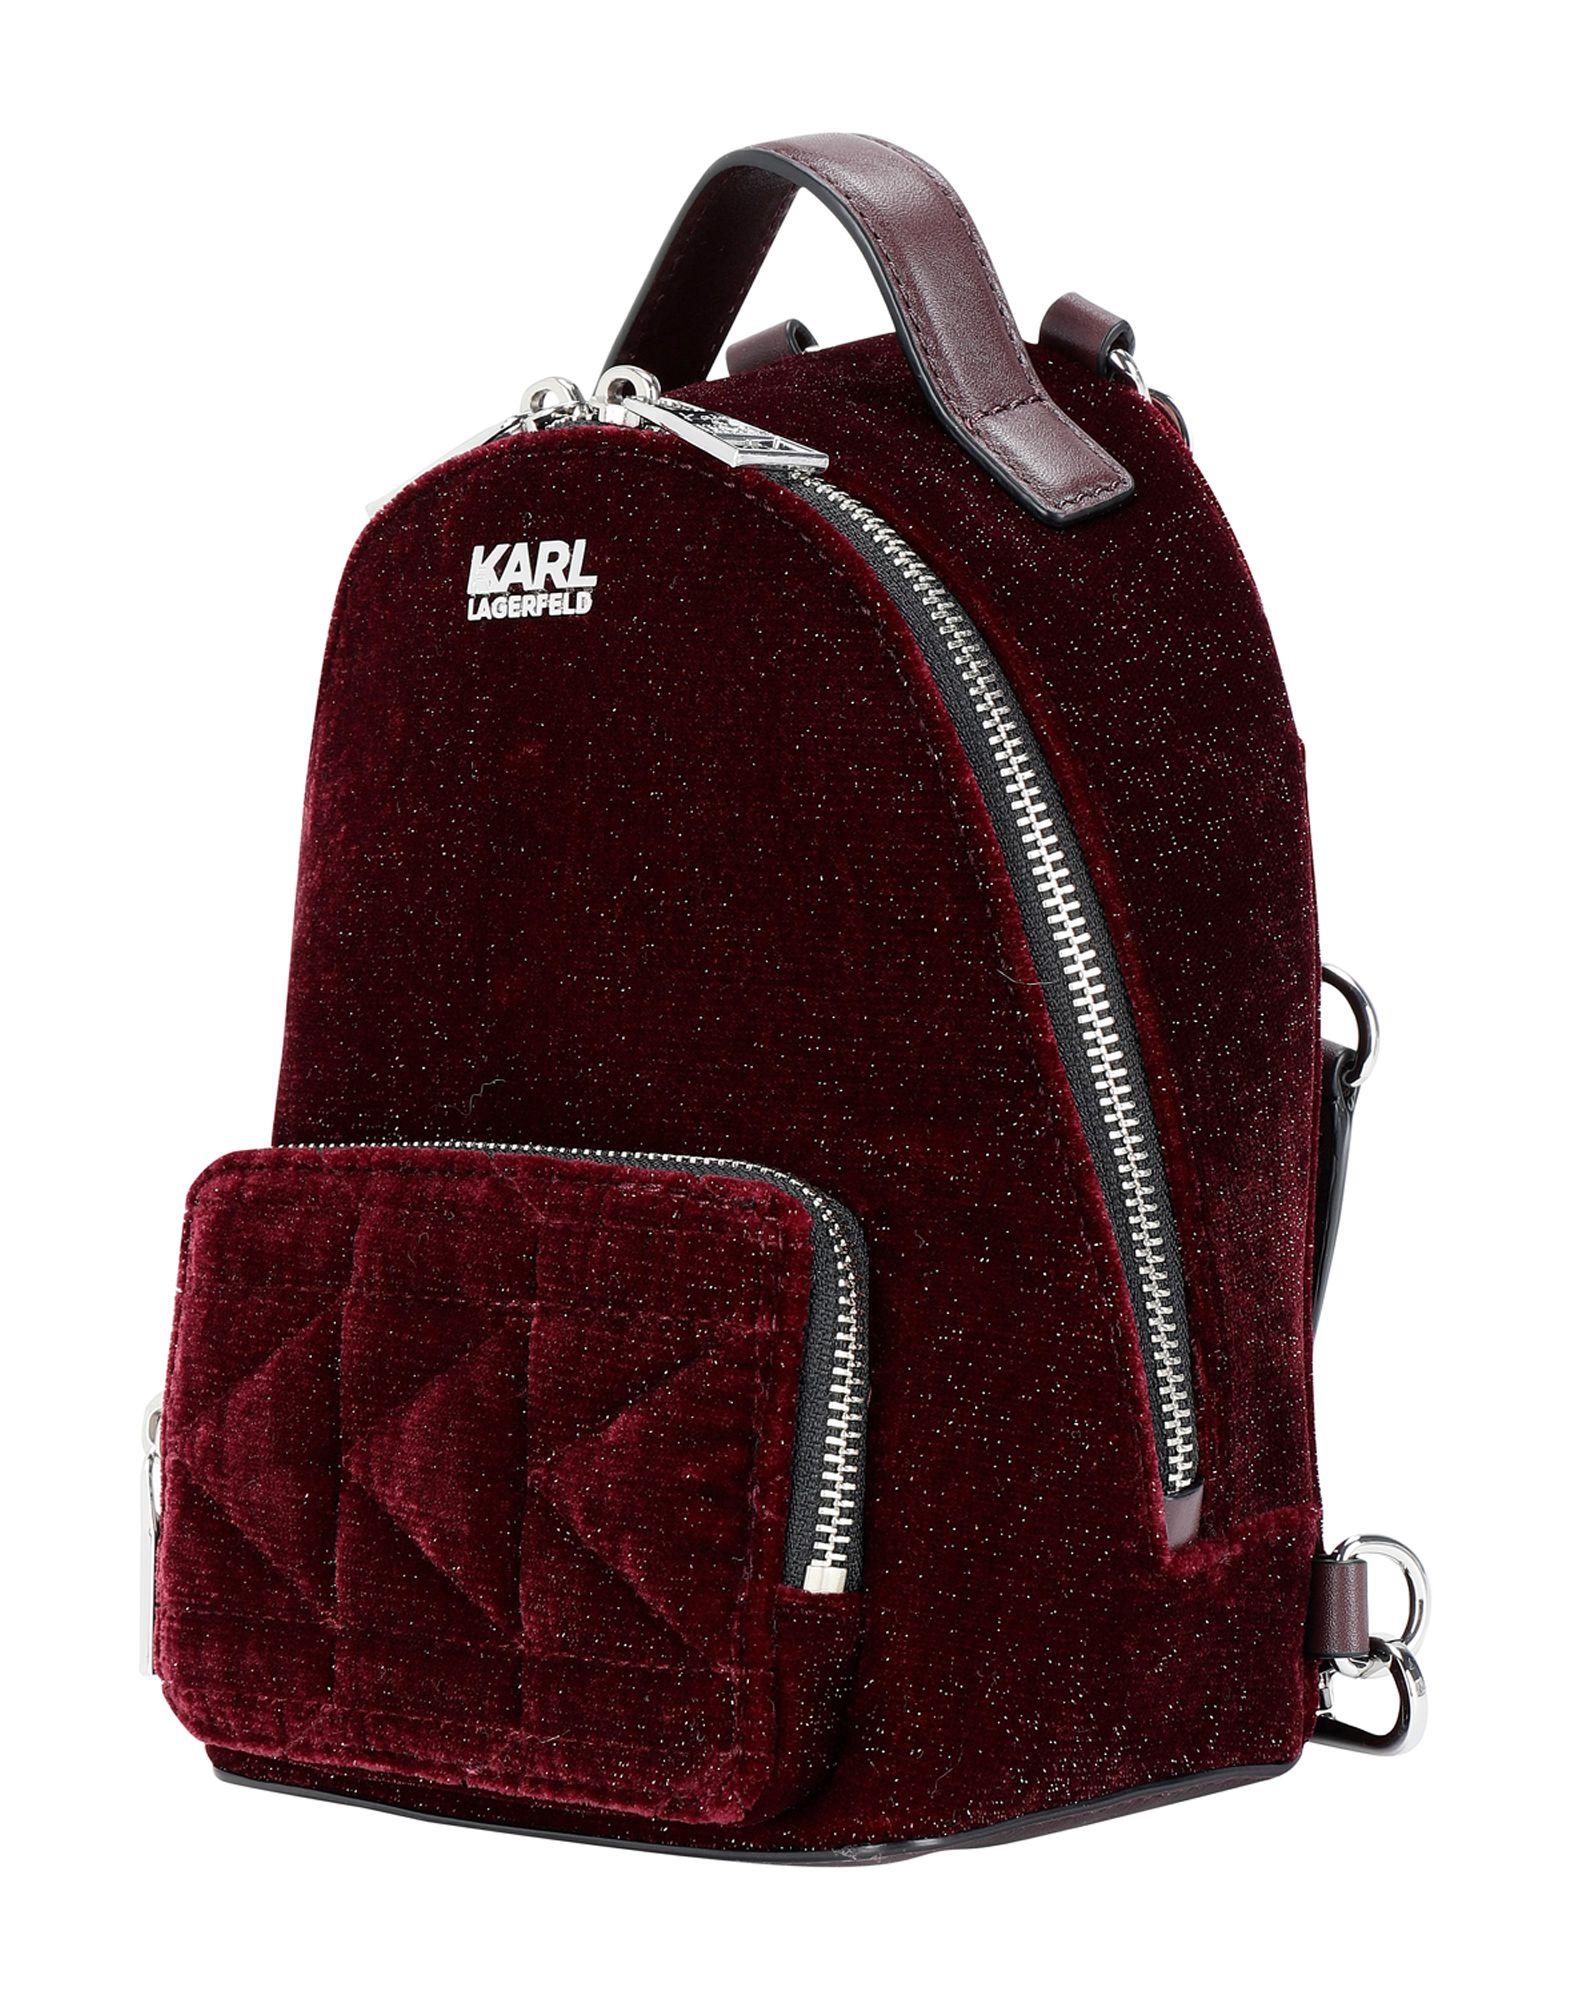 KARL LAGERFELD x KAIA Рюкзаки и сумки на пояс alev kaia eelista toolepingut